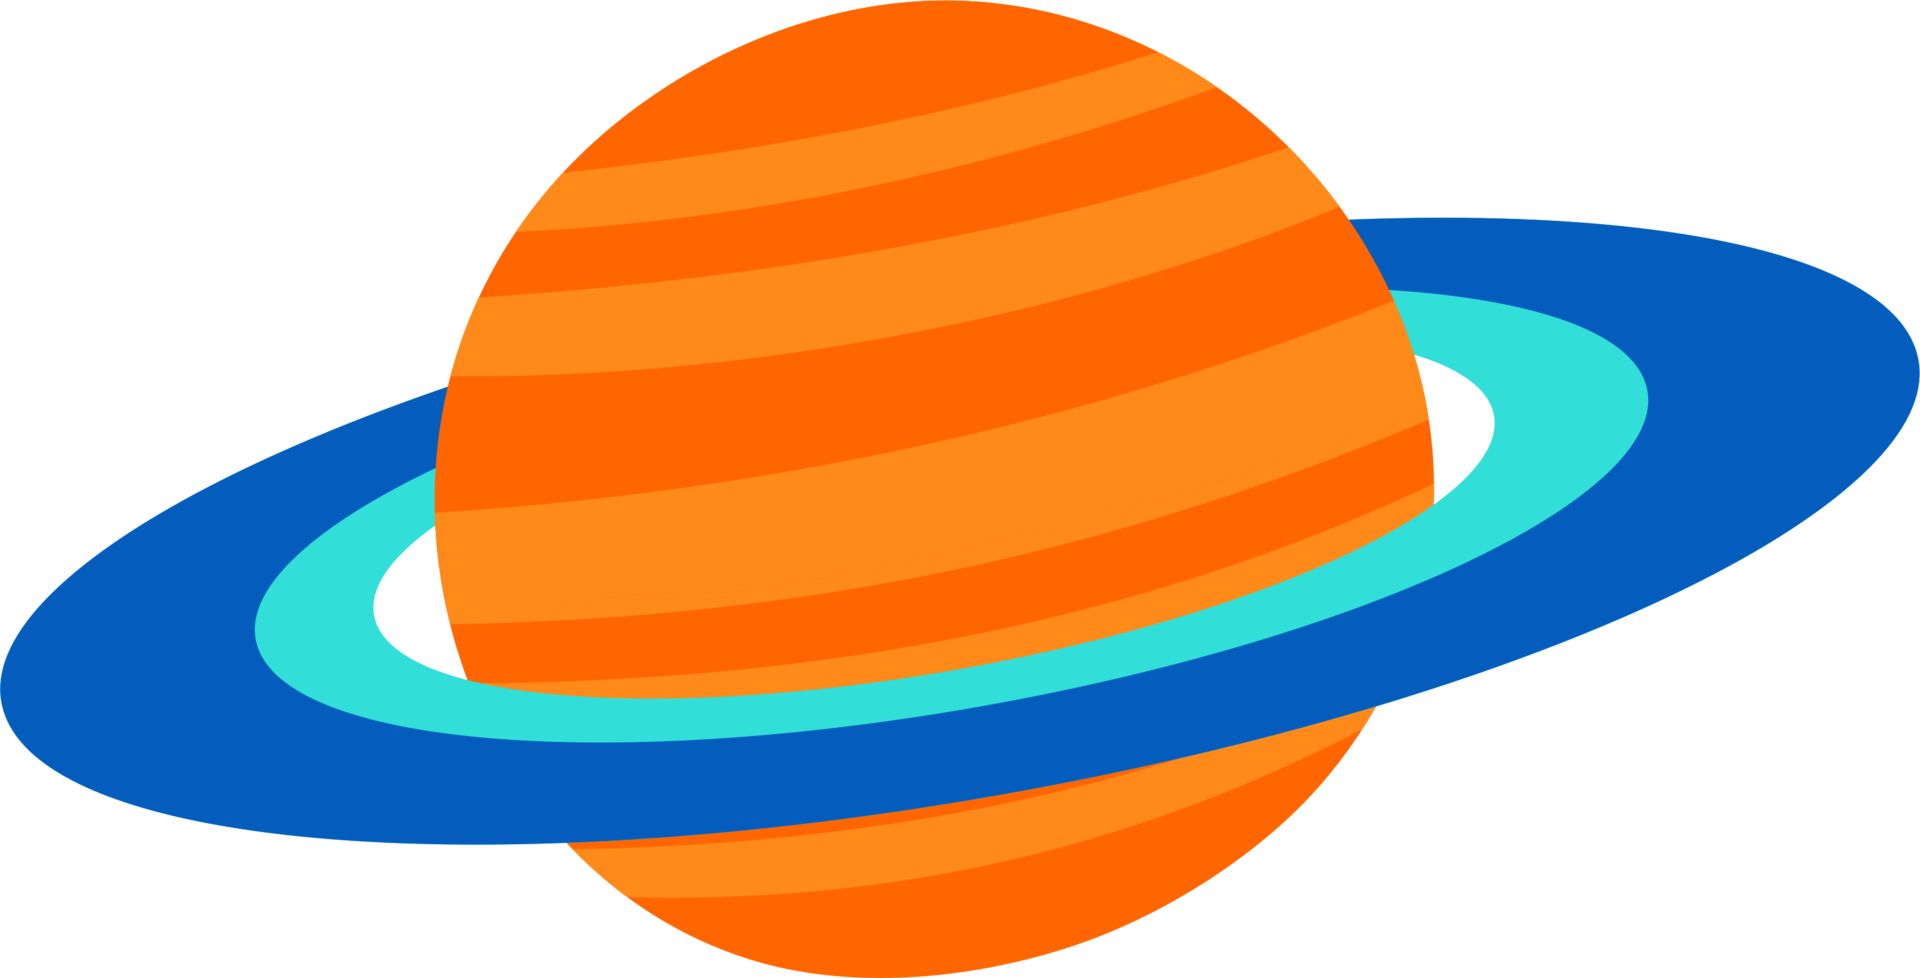 shared exibir todas. Planets clipart space stuff